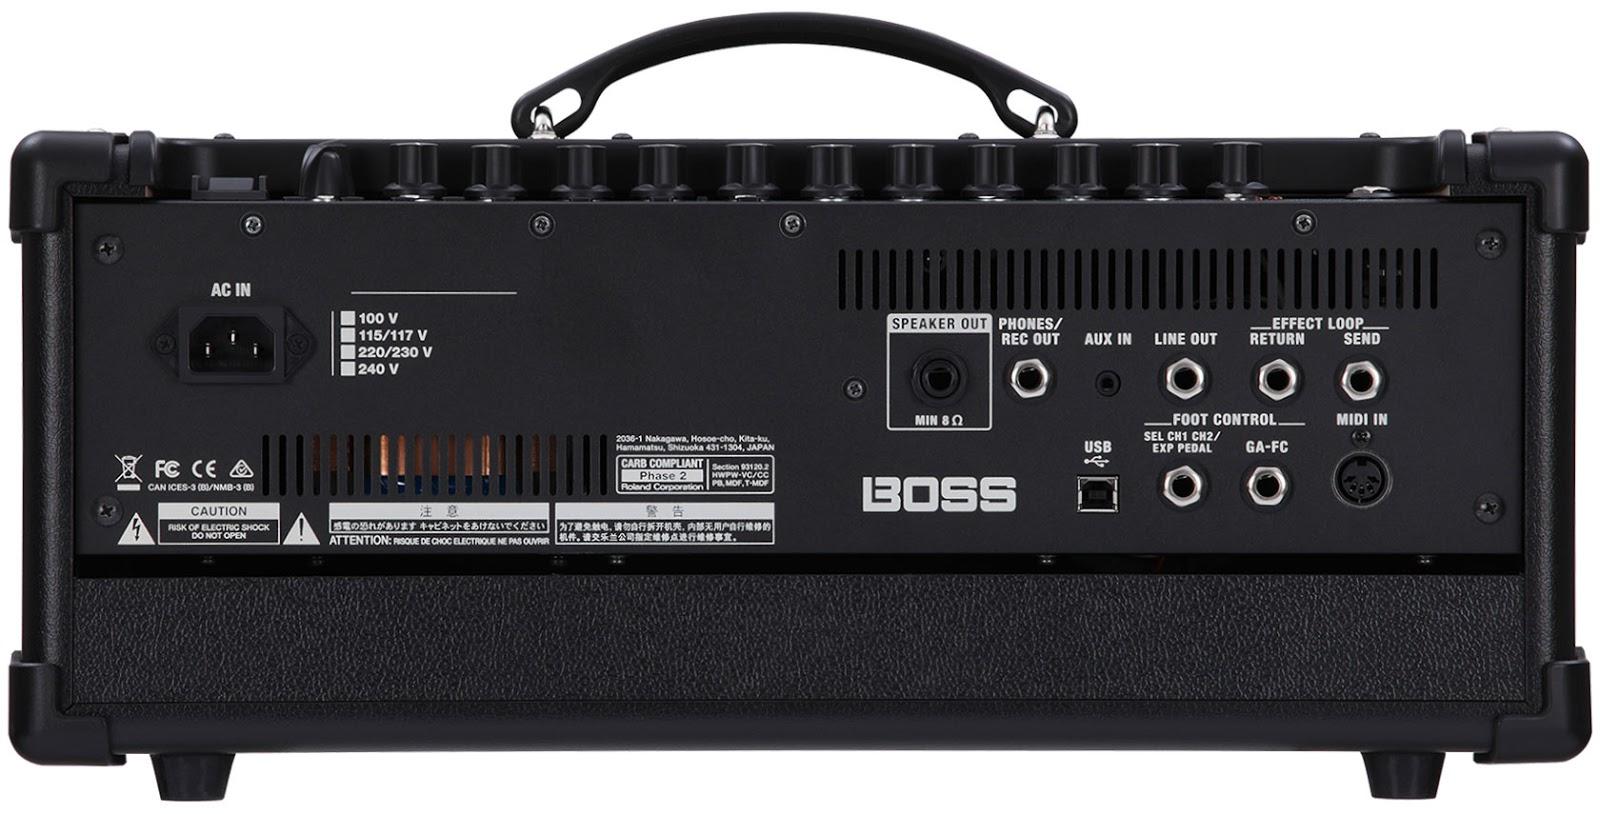 Gear Otaku Boss Katana Amp 発表。5アンプモデル、55エフェクト搭載で手頃な価格のギターアンプ